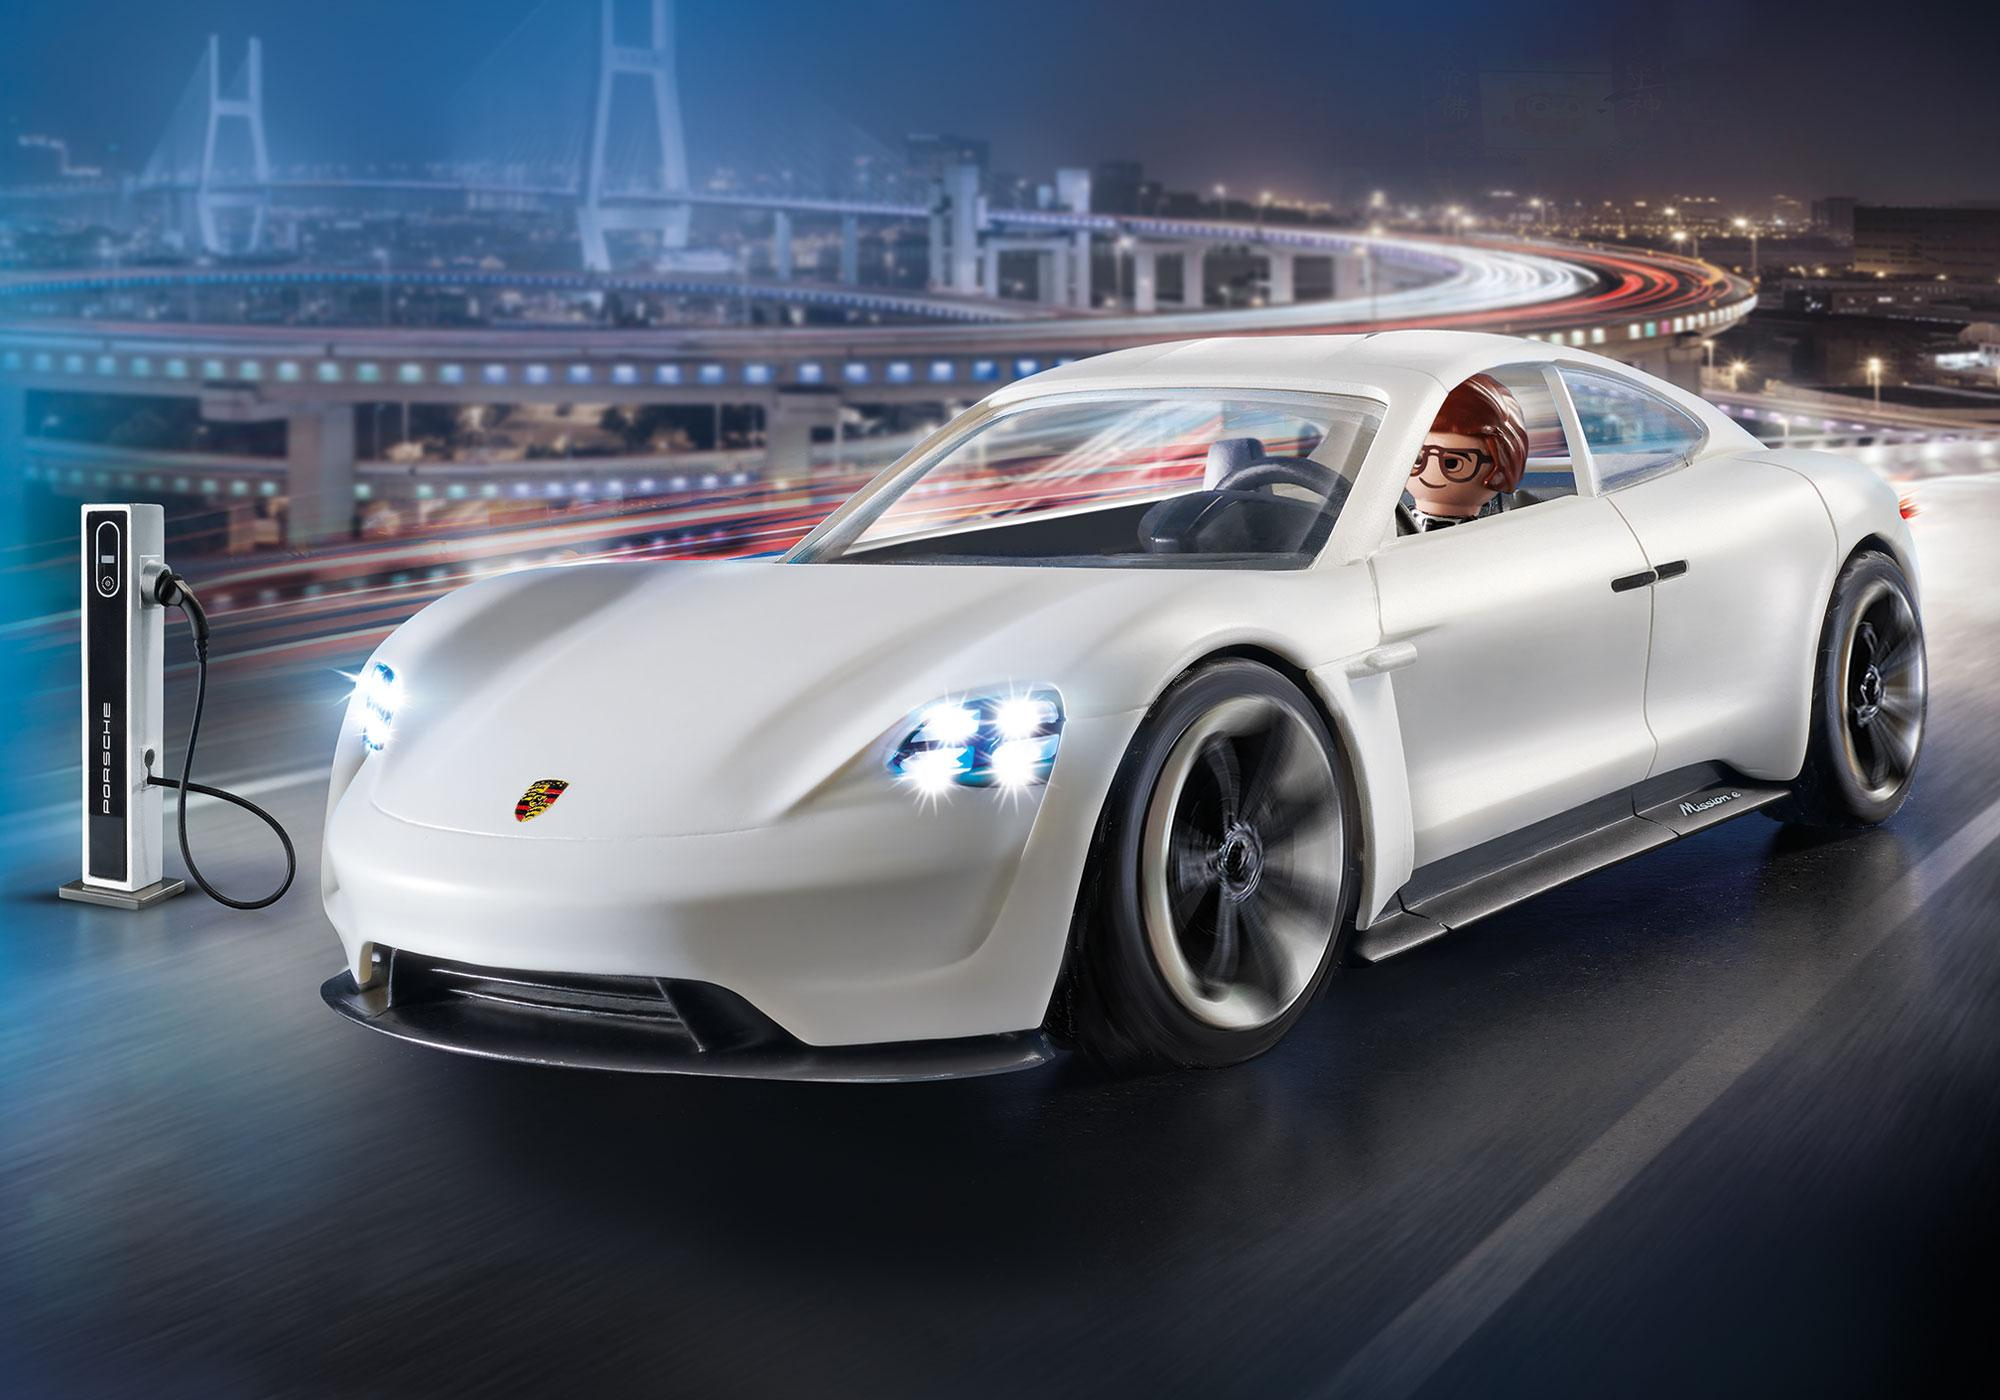 http://media.playmobil.com/i/playmobil/70078_product_detail/PLAYMOBIL: THE MOVIE Porsche Mission-E di Rex Dasher